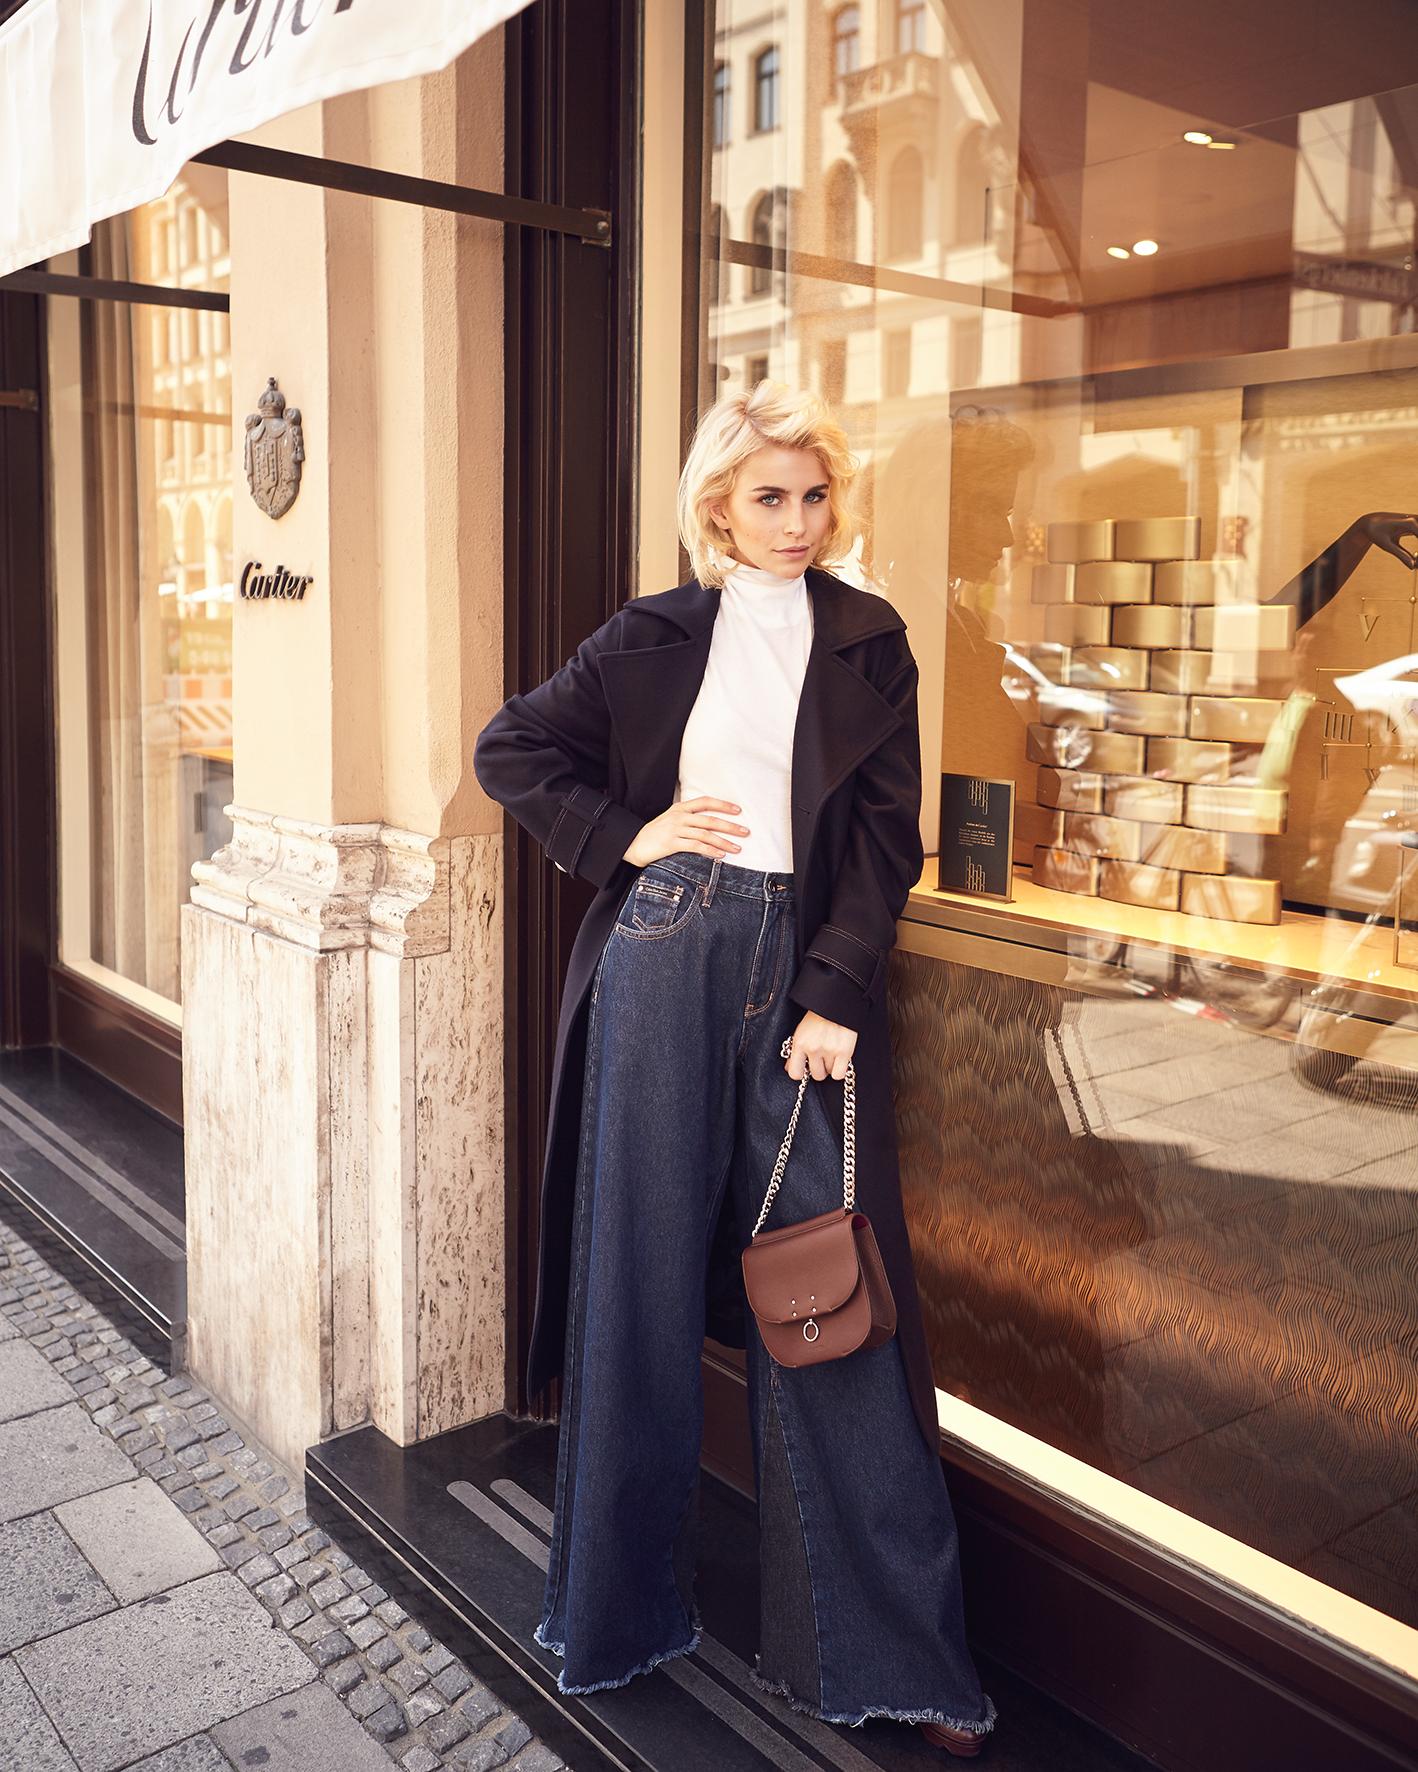 Female fashion editorial with Blogger Caro Daur by Heidi Rondak for FACES Magazine